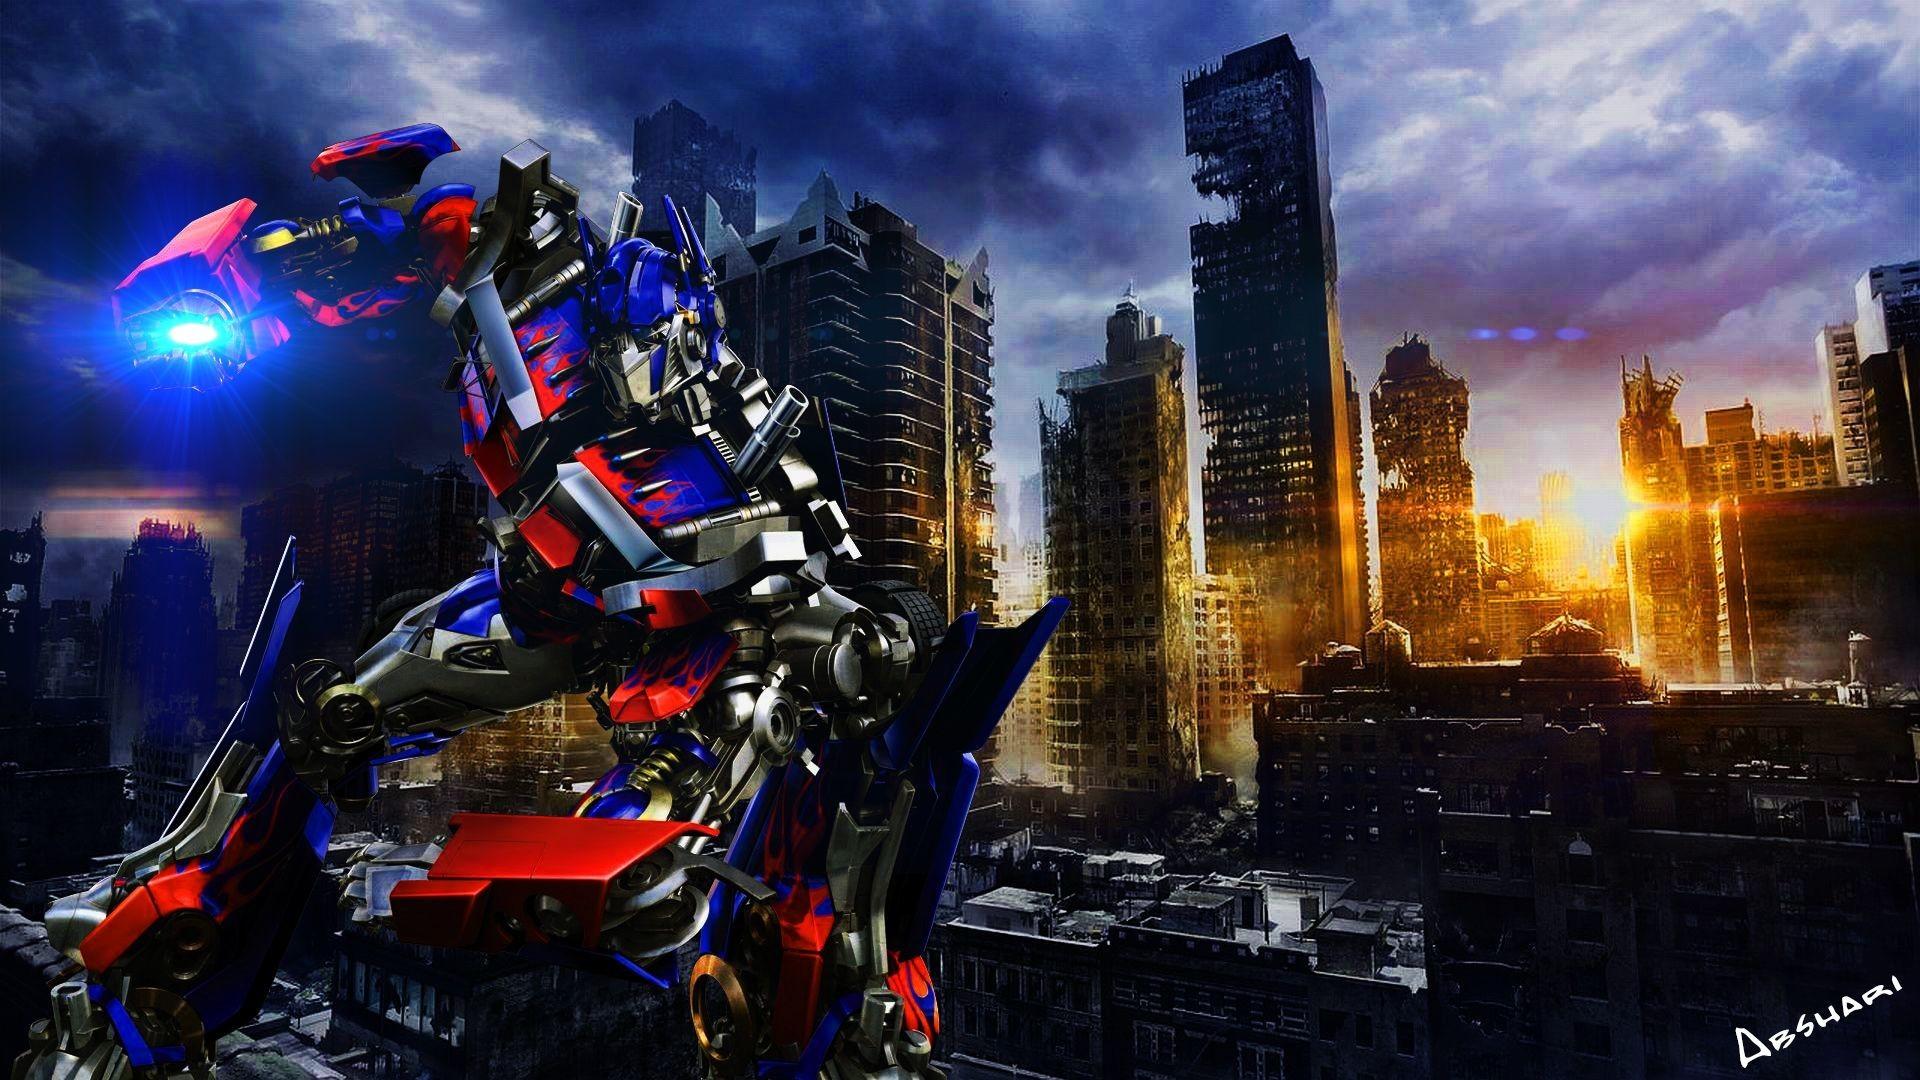 1920x1080, Transformers Optimus Prime Hd Desktop Wallpaper - Optimus Prime Background - HD Wallpaper